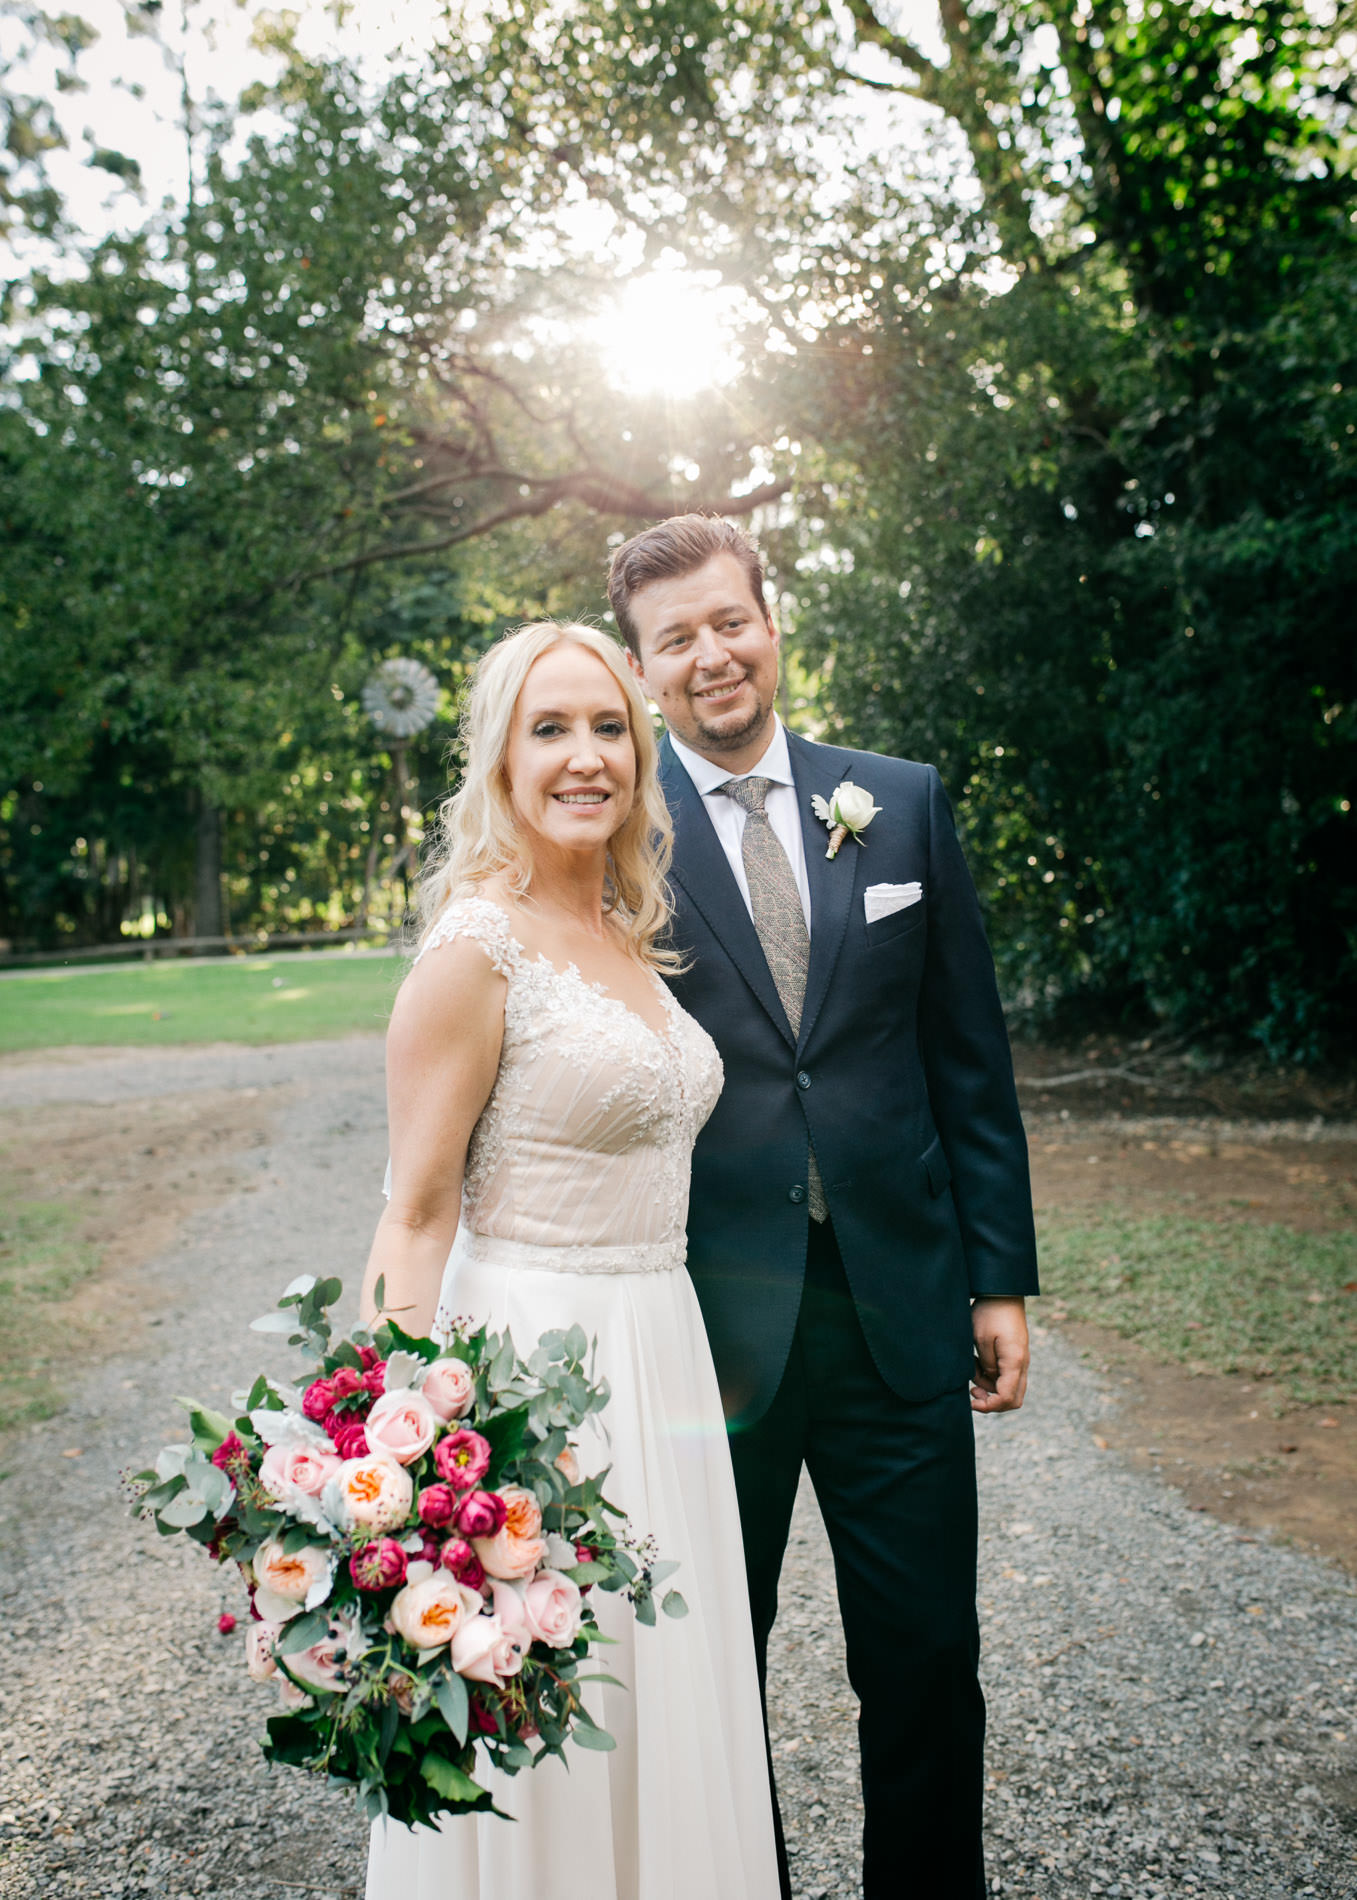 True North Photography_Boomerang Farm_Stacey and Isaac_Gold Coast Wedding_Barm Wedding_Hinterland Wedding-128.jpg